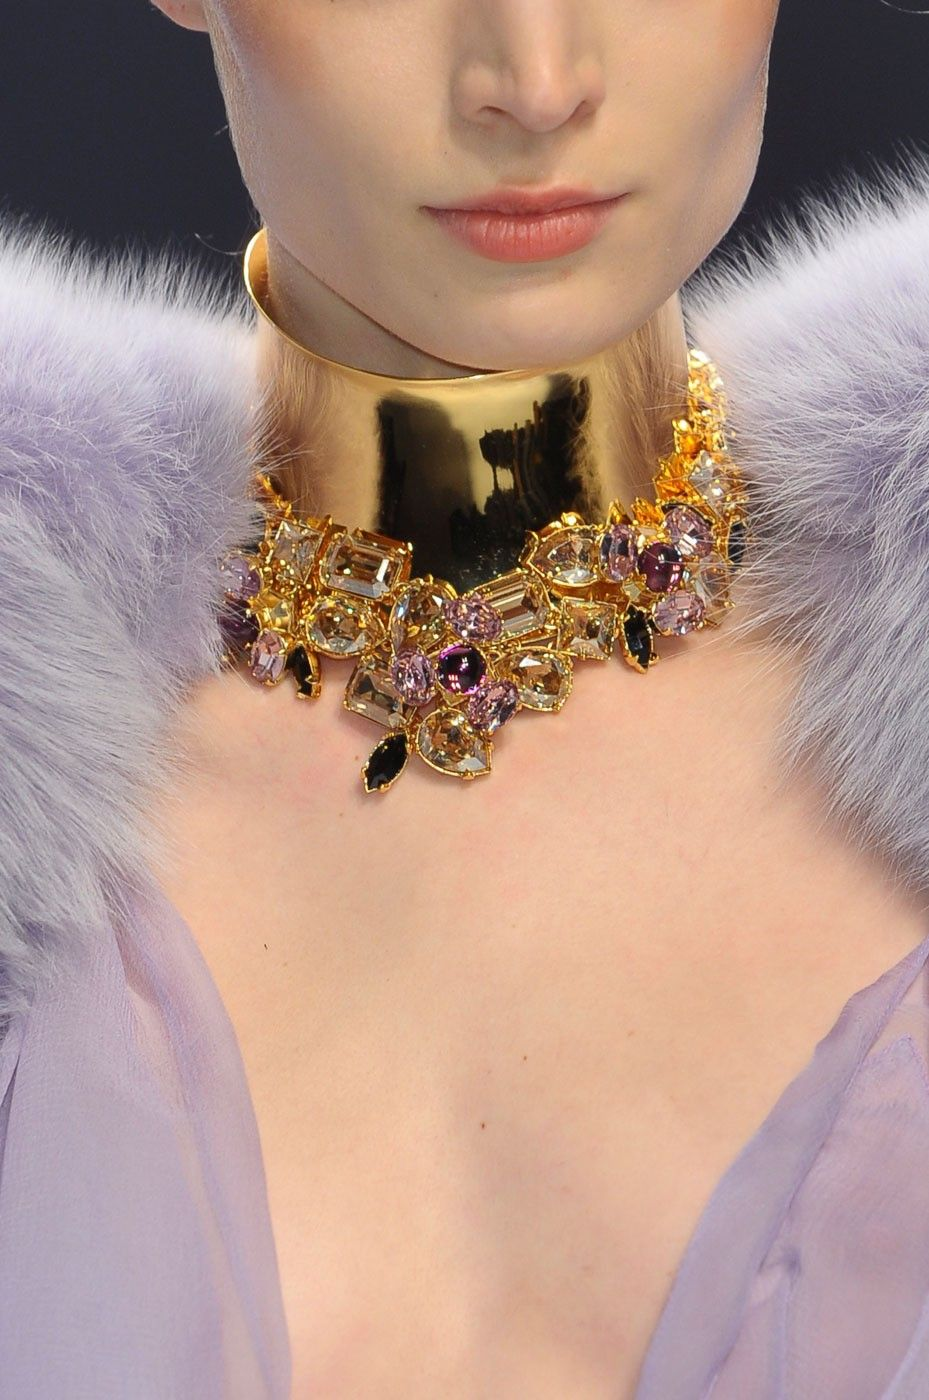 "Alexandre Vauthier - Fashion - Night gown - Fur - Necklace - Jewellery ""…He Made you garments.."" Surah Nahl, 81 ""….giyimlikler de Var etti..."" Nahl Suresi, 81"